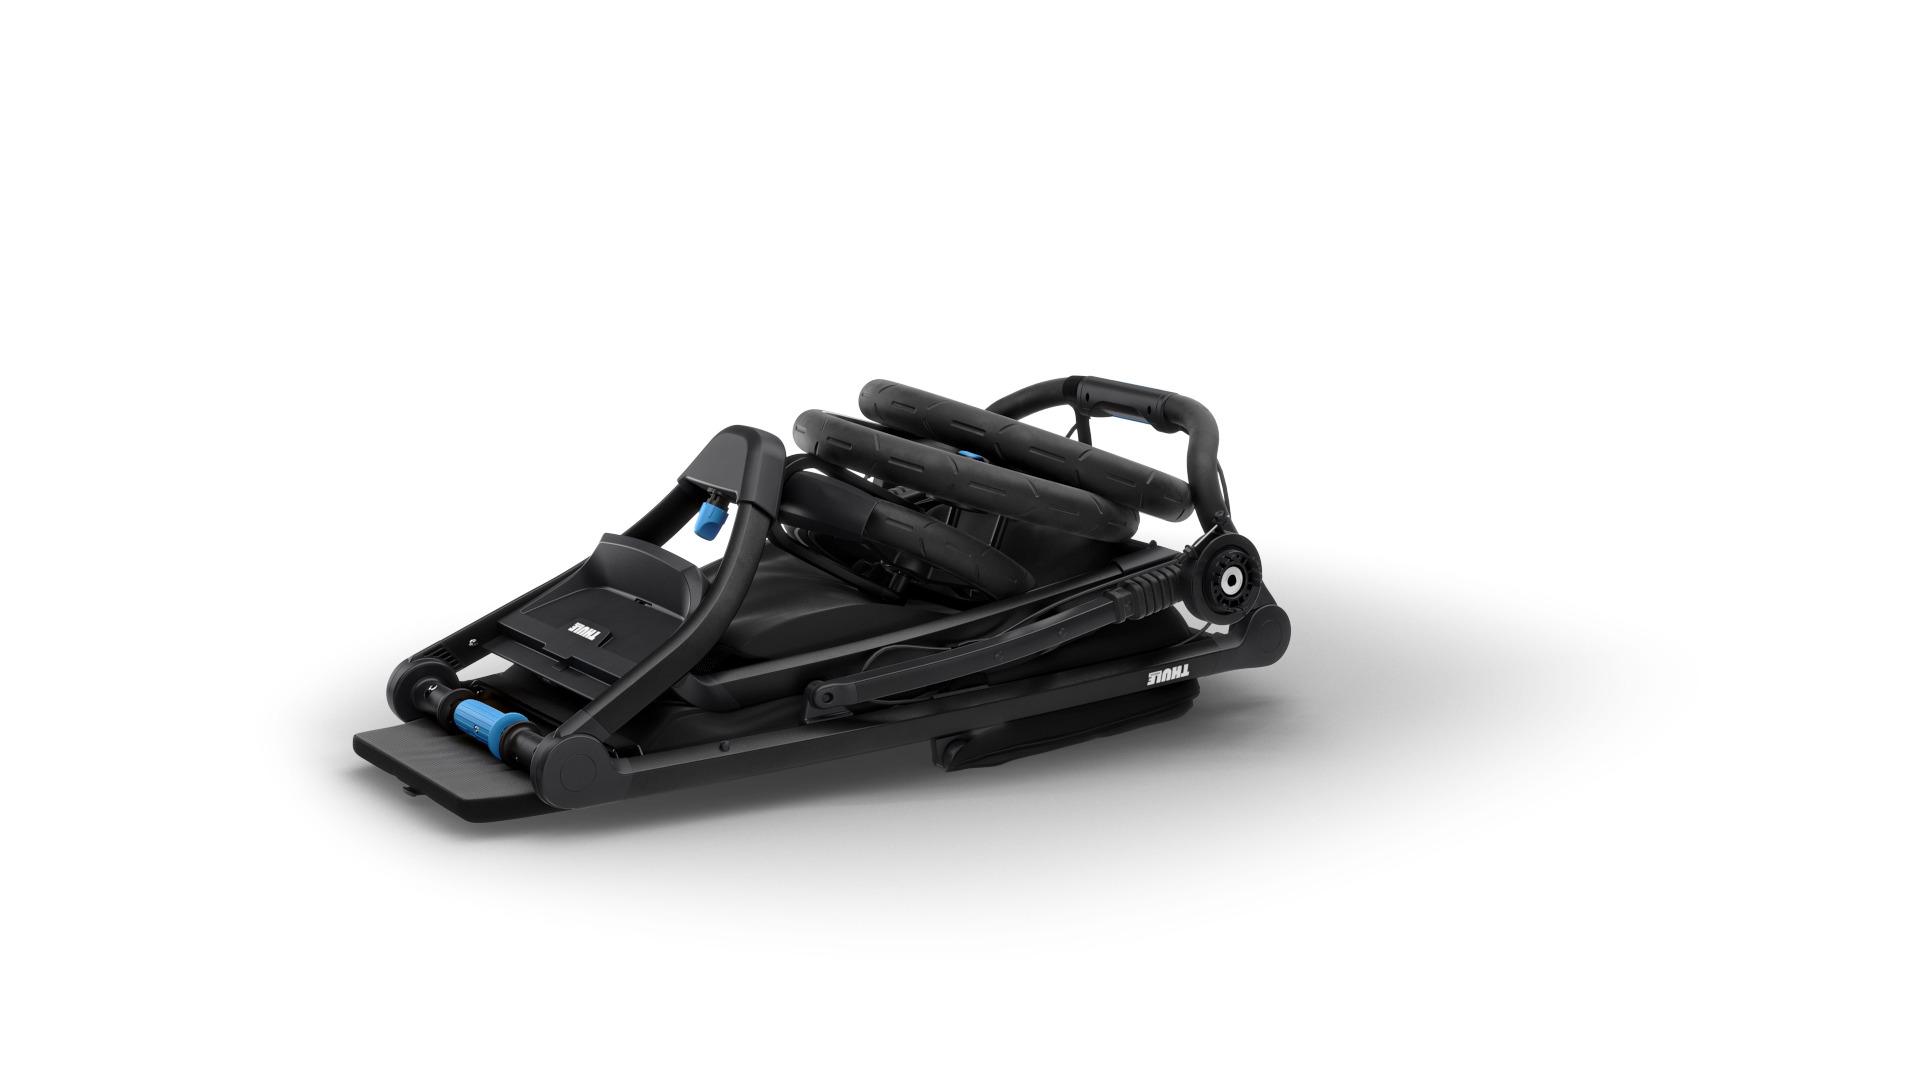 Wózek do biegania THULE Urban Glide 2 Black on Black